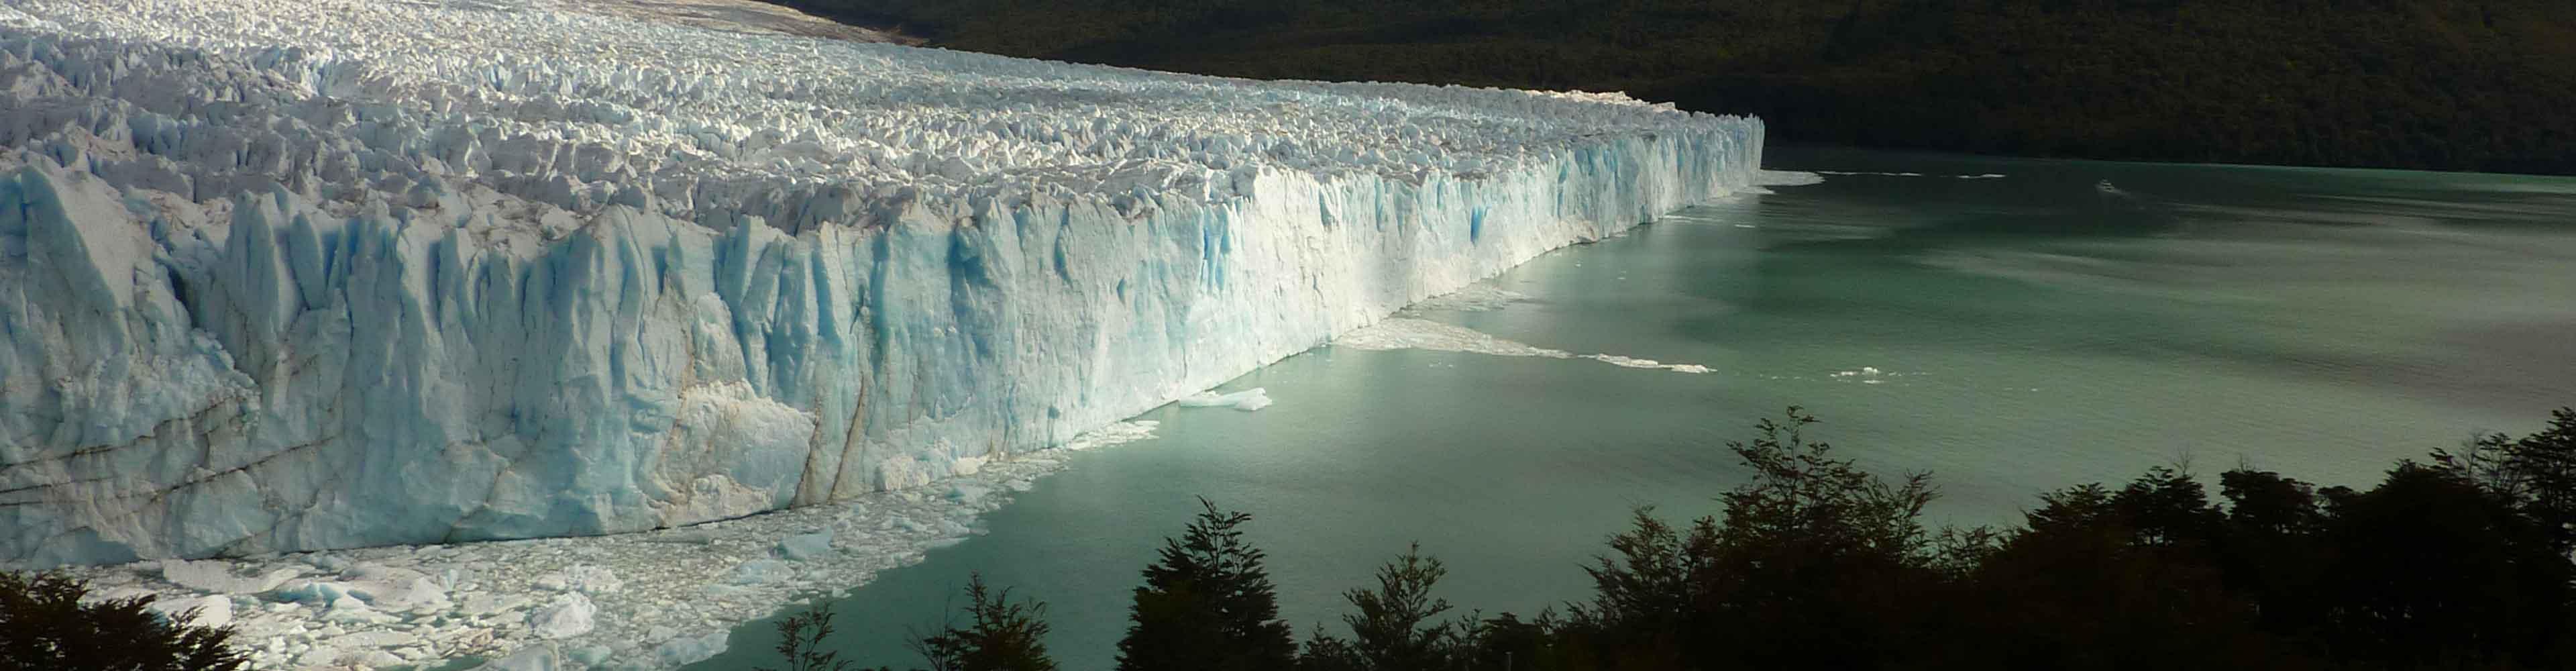 Perito Moreno Glacier Experience – Independent